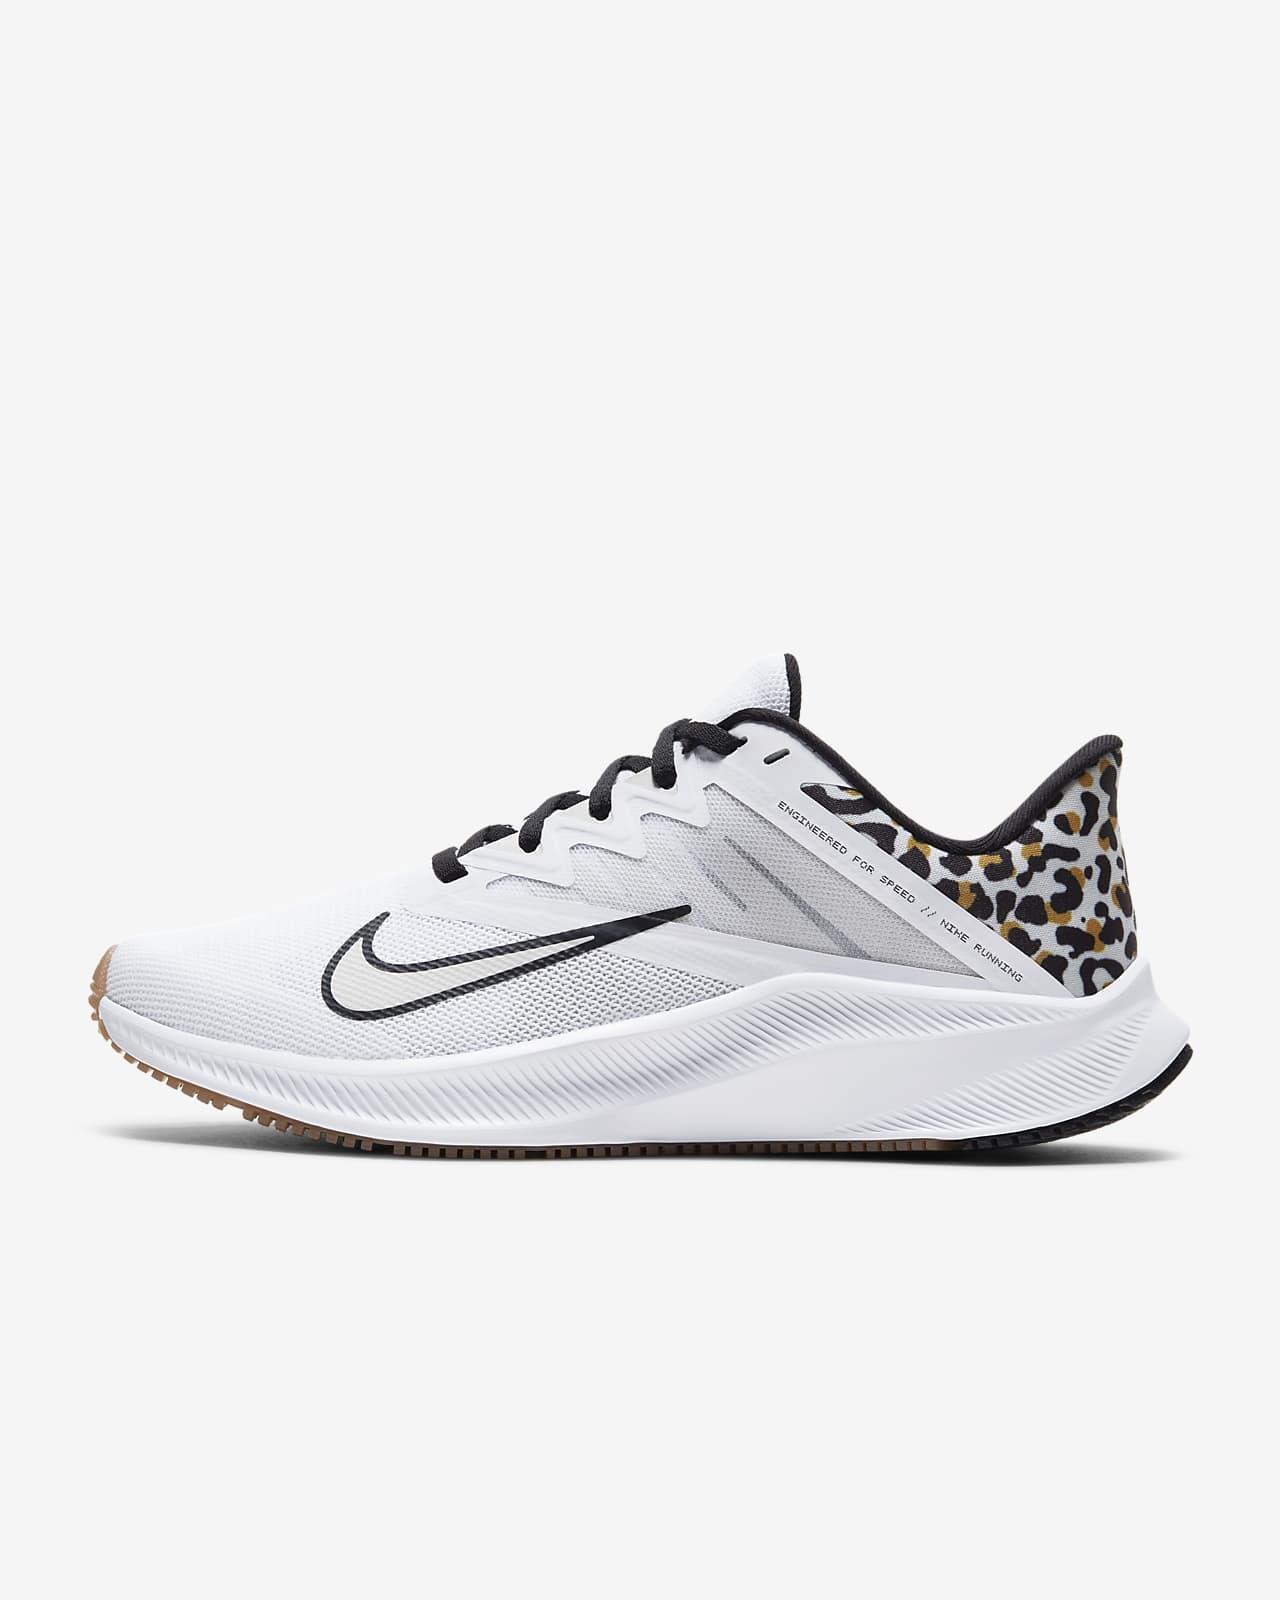 Calzado de running para mujer Nike Quest 3 Premium